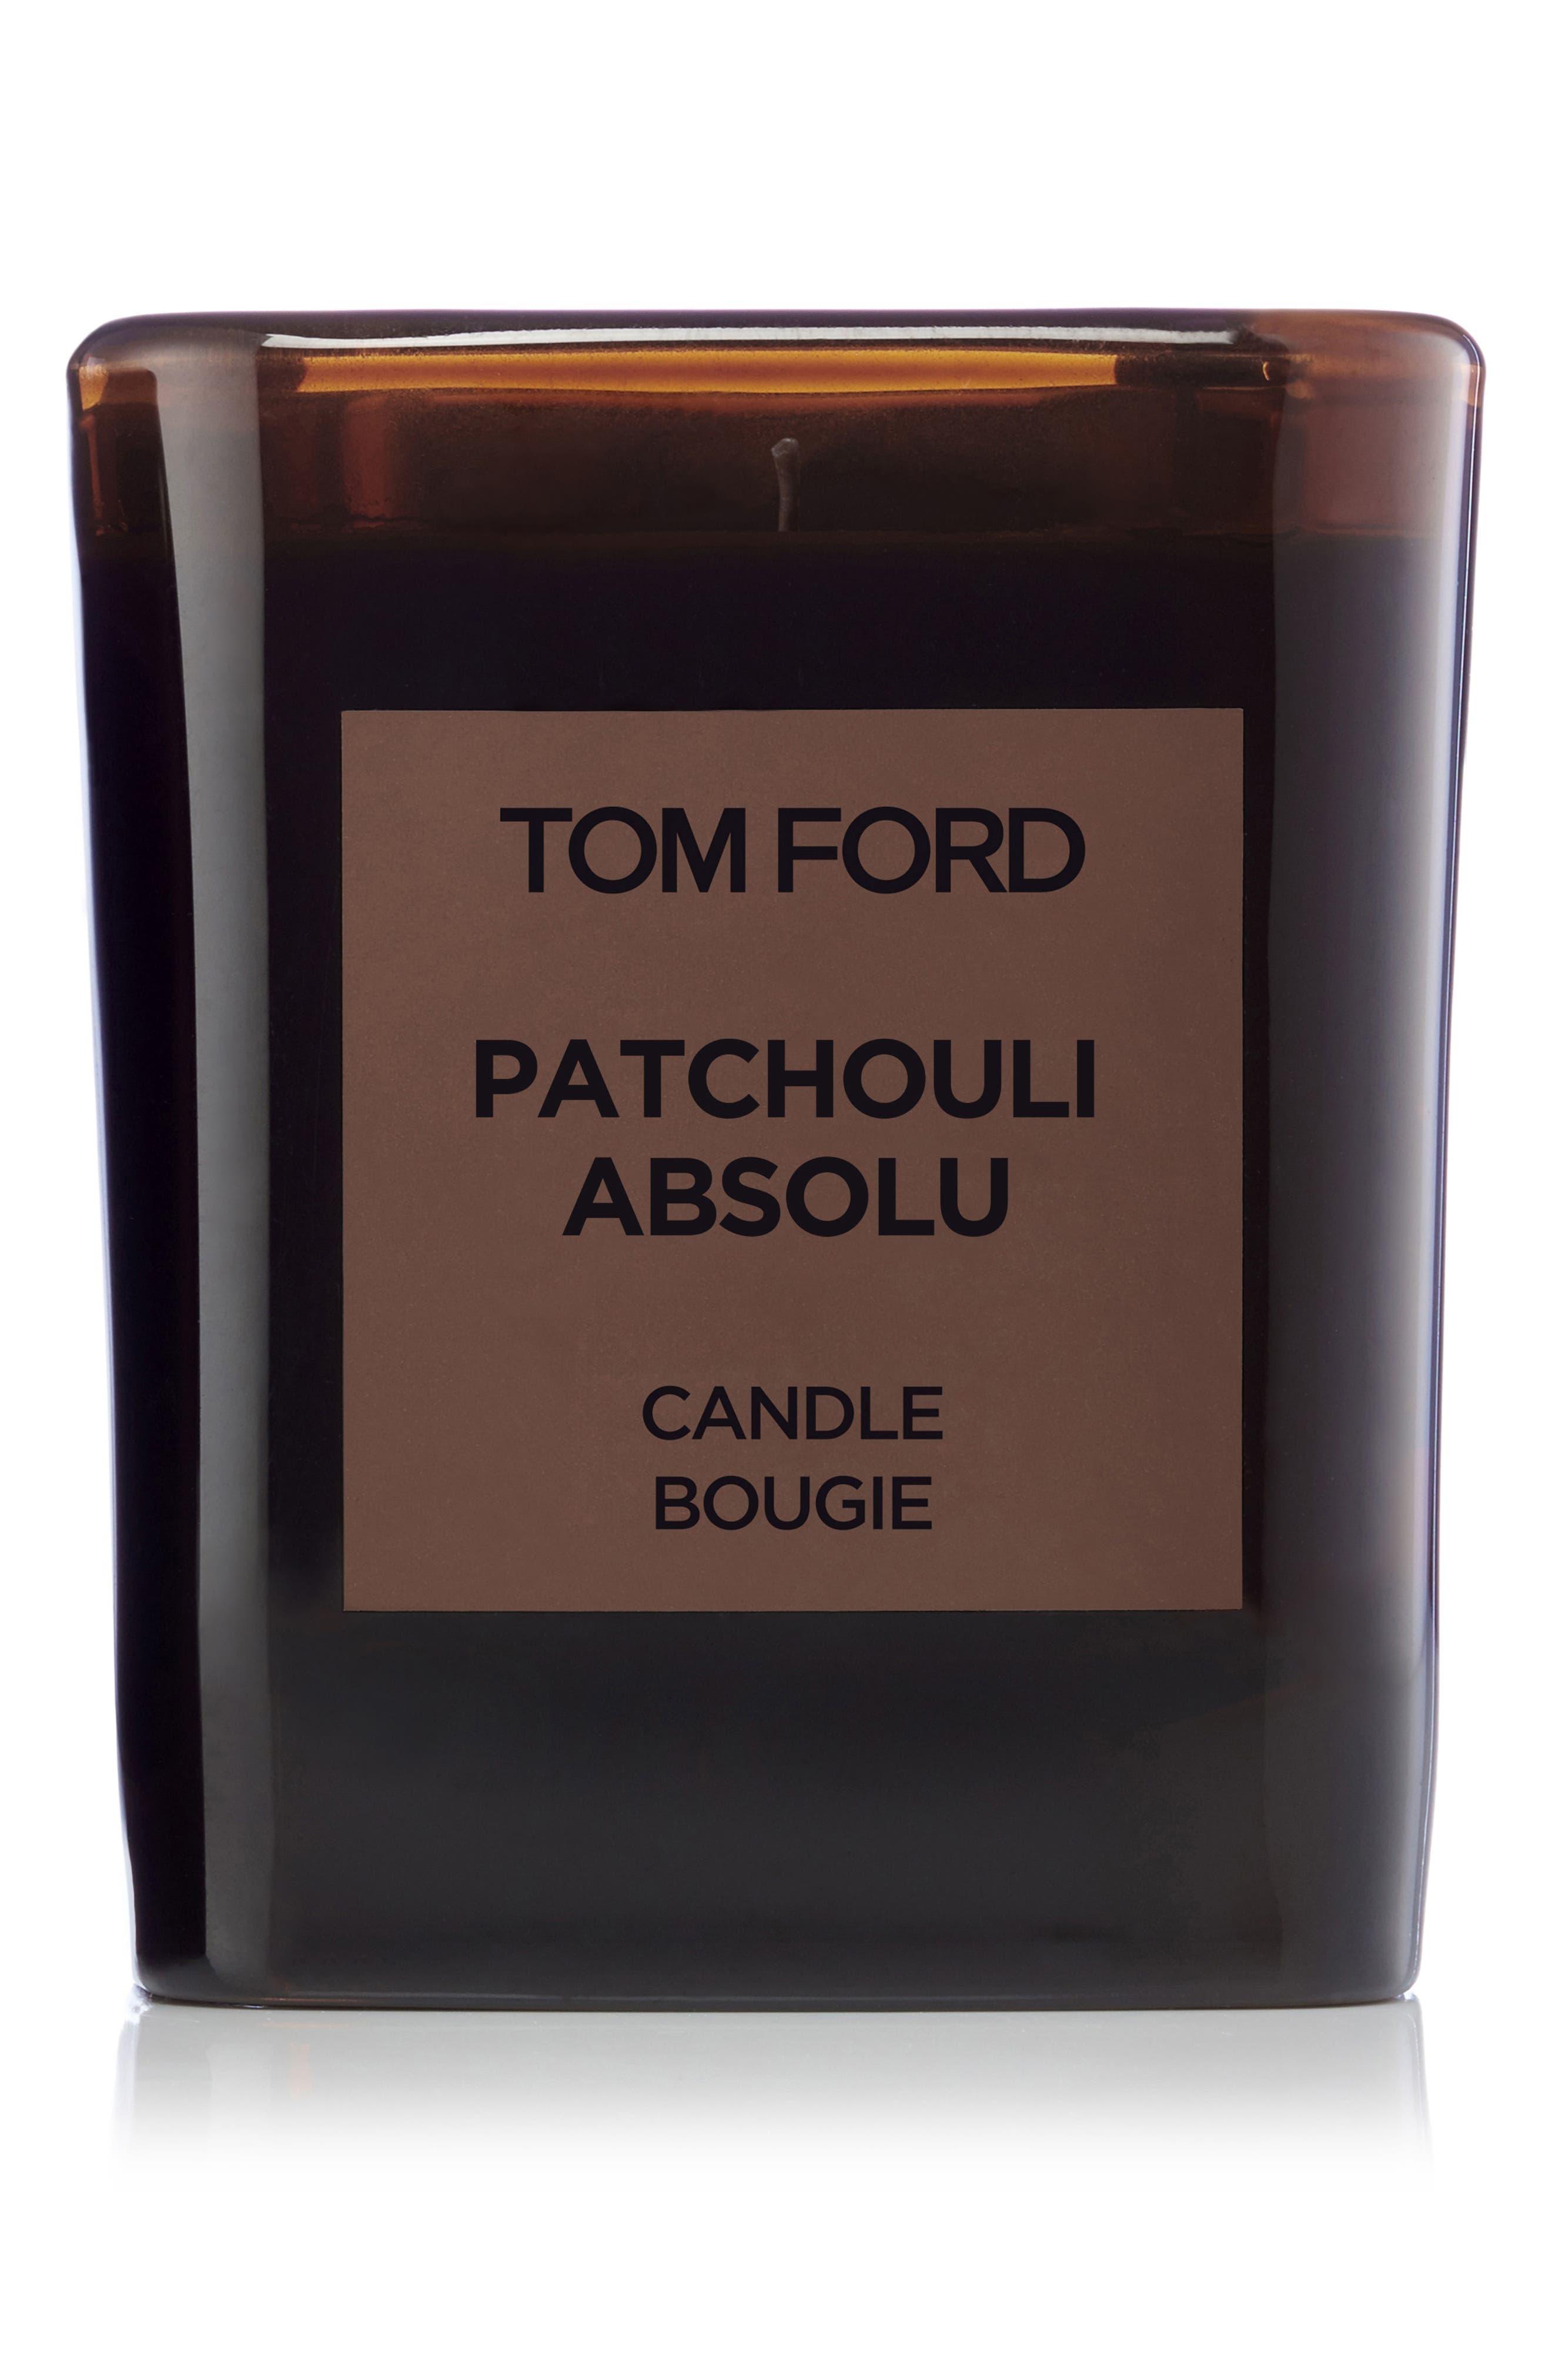 Patchouli Absolu Candle,                             Main thumbnail 1, color,                             No Color